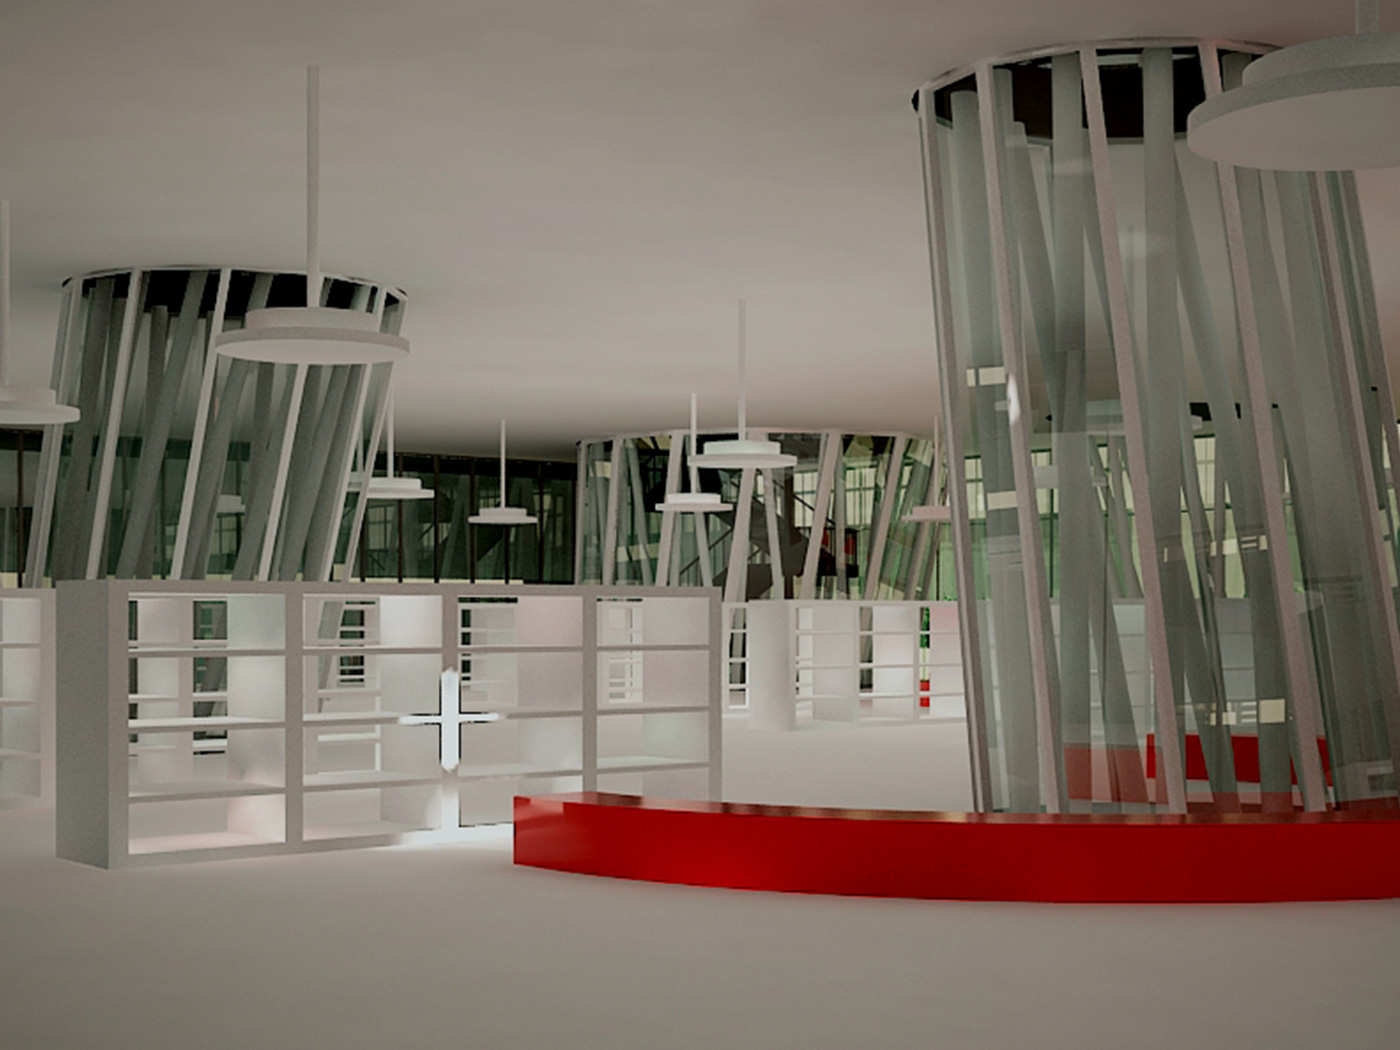 Sendai Mediateque by Toyo Ito, 3D model & rendering by Chiara Mensa